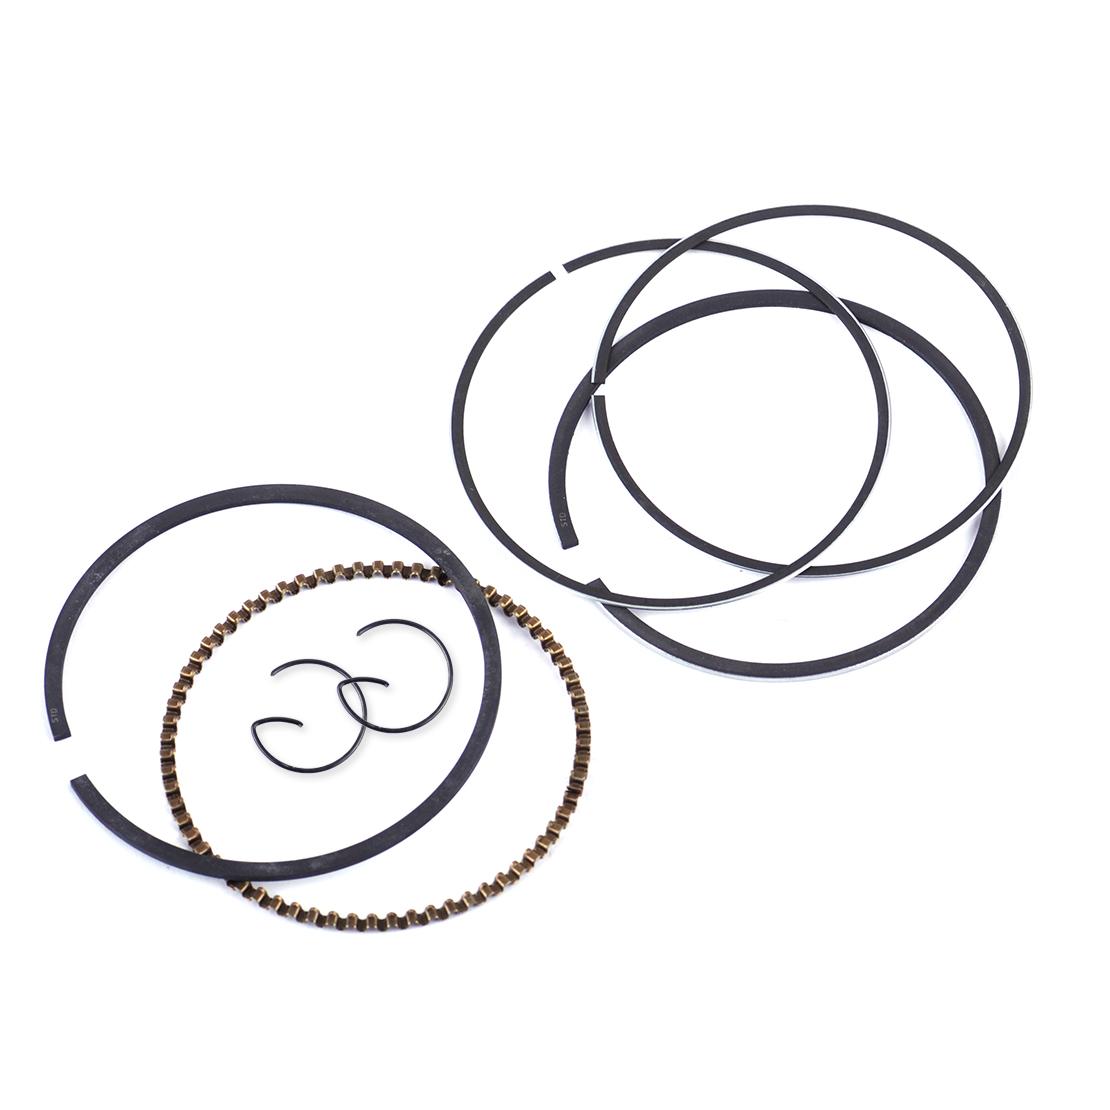 Piston Pin Circlip Ring Oil Seal Gasket For Honda Gx160 5